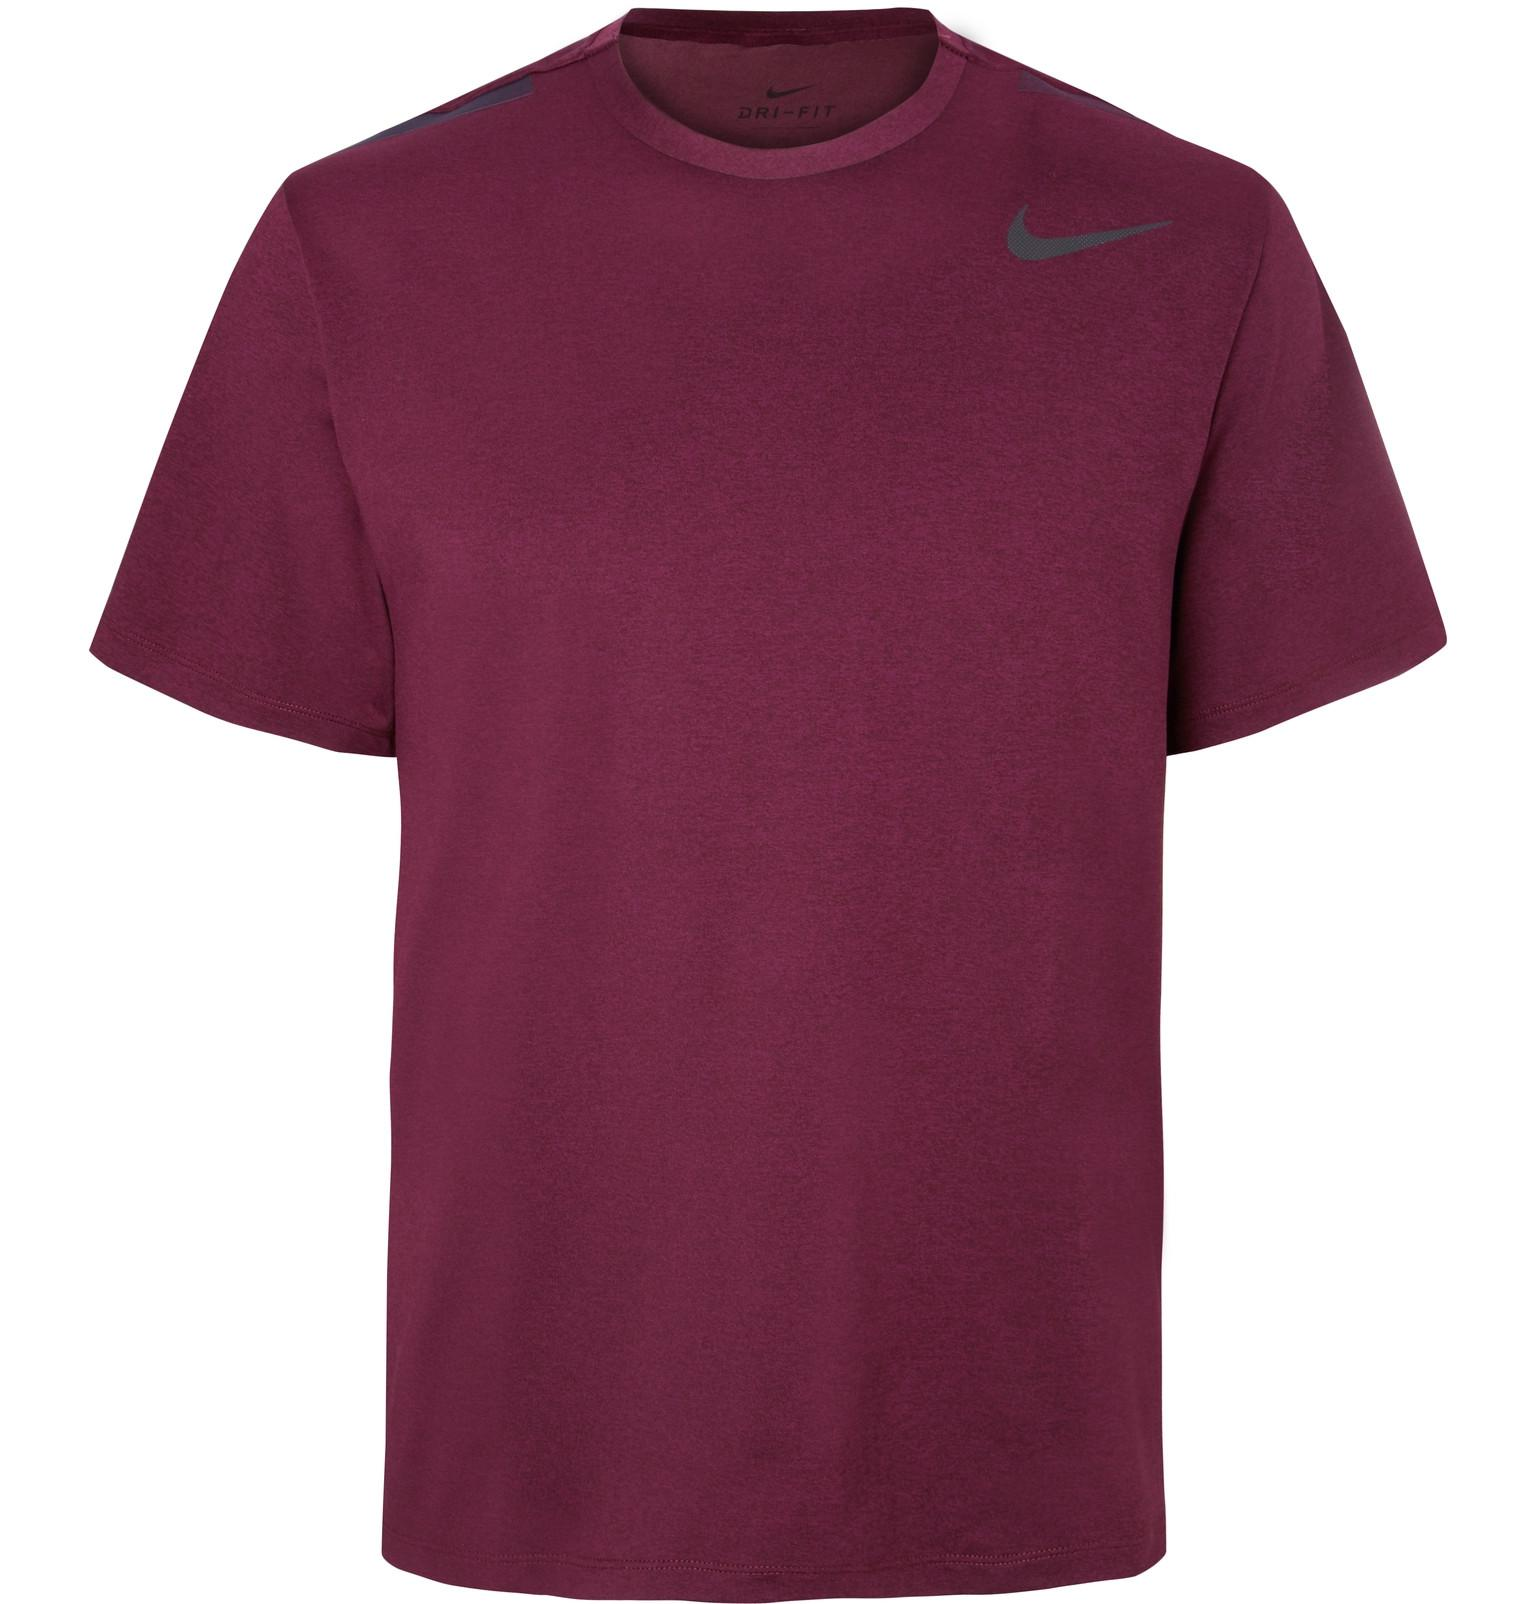 bafe223e57f Nike Hypermax Mélange Dri-fit T-shirt in Purple for Men - Lyst